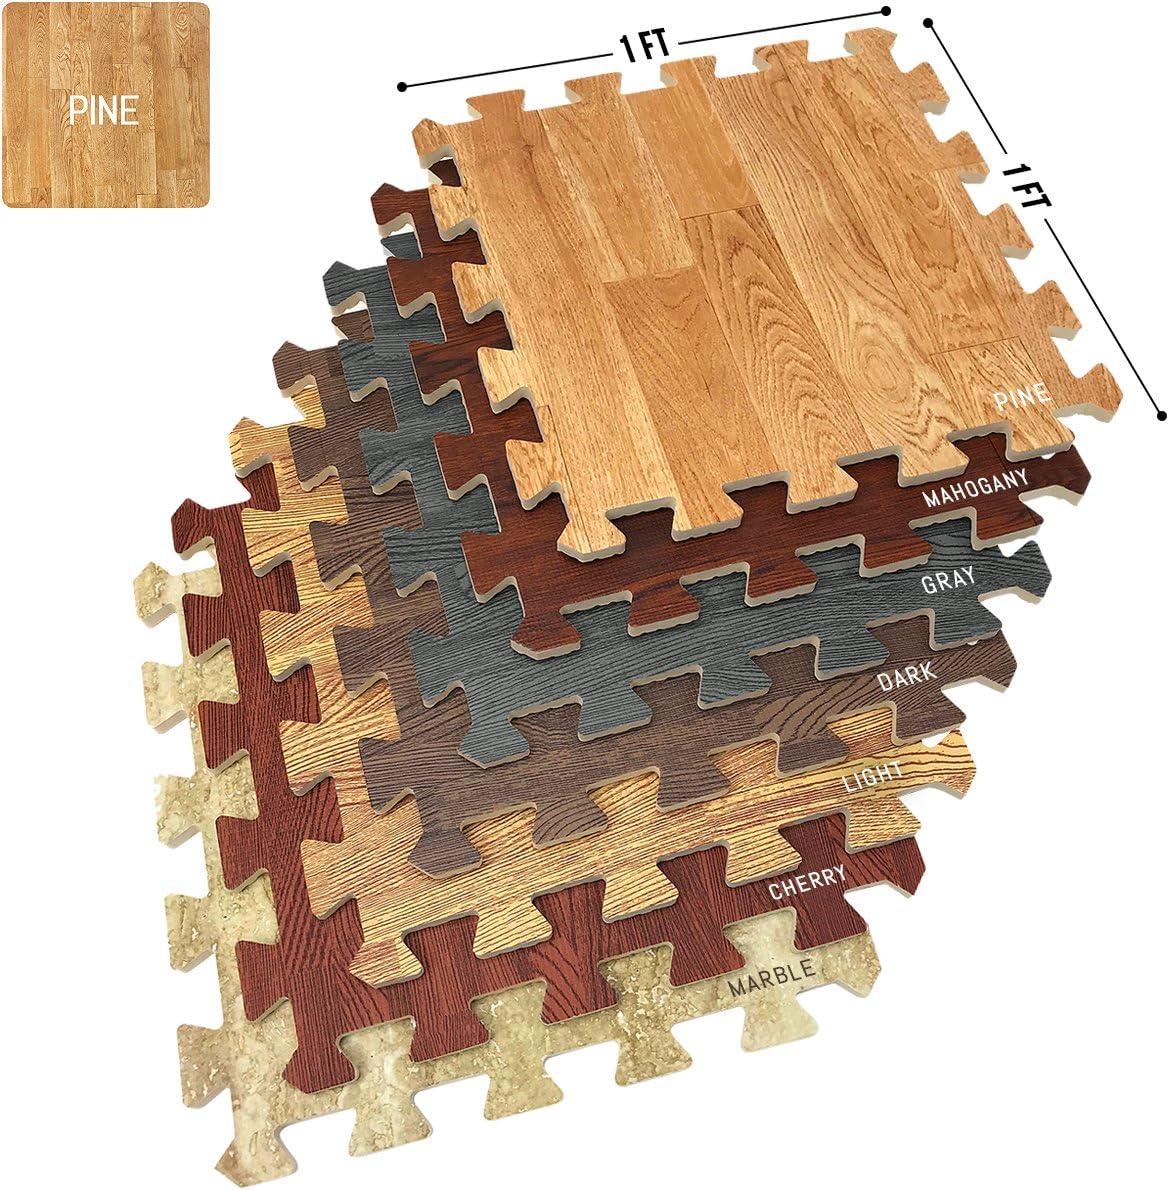 Sorbus Wood Grain Floor Mats Foam Interlocking Mats Each Tile 3/8-Inch Thick Flooring Wood Mat Tiles - Home Office Playroom Basement Trade Show